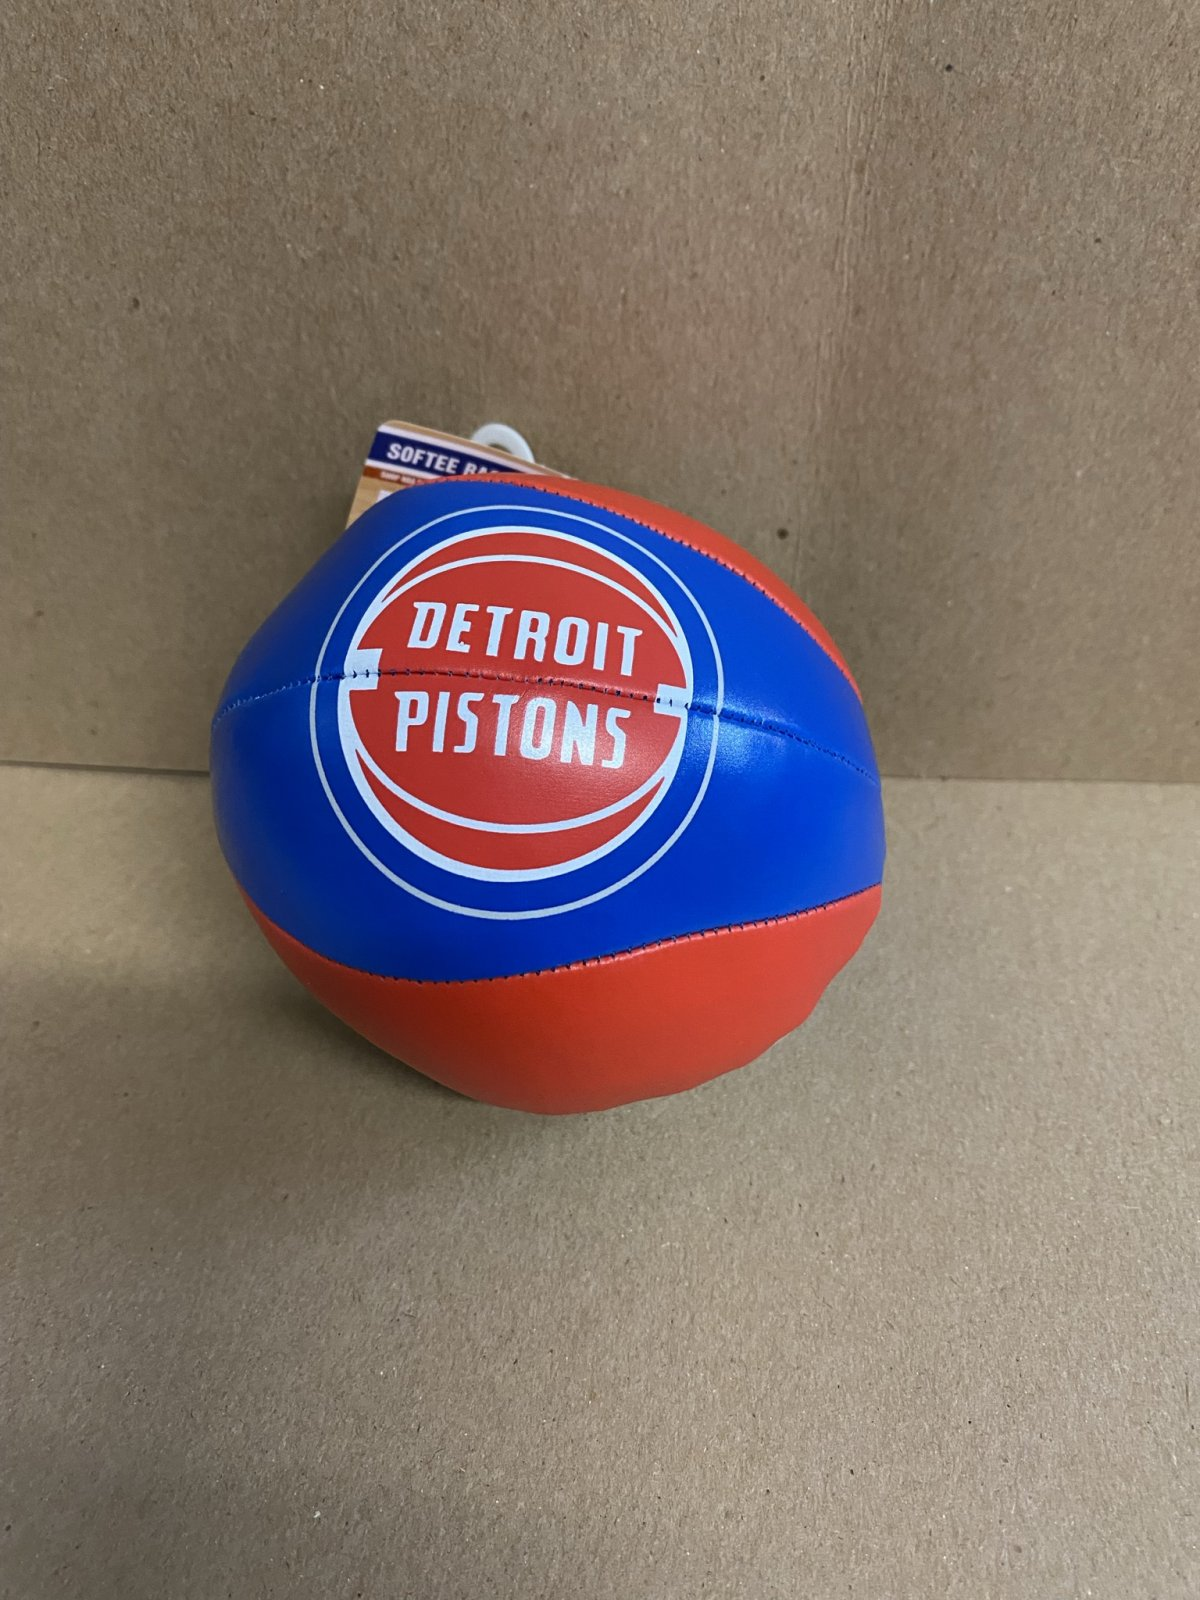 Detroit Pistons Softee Basketball